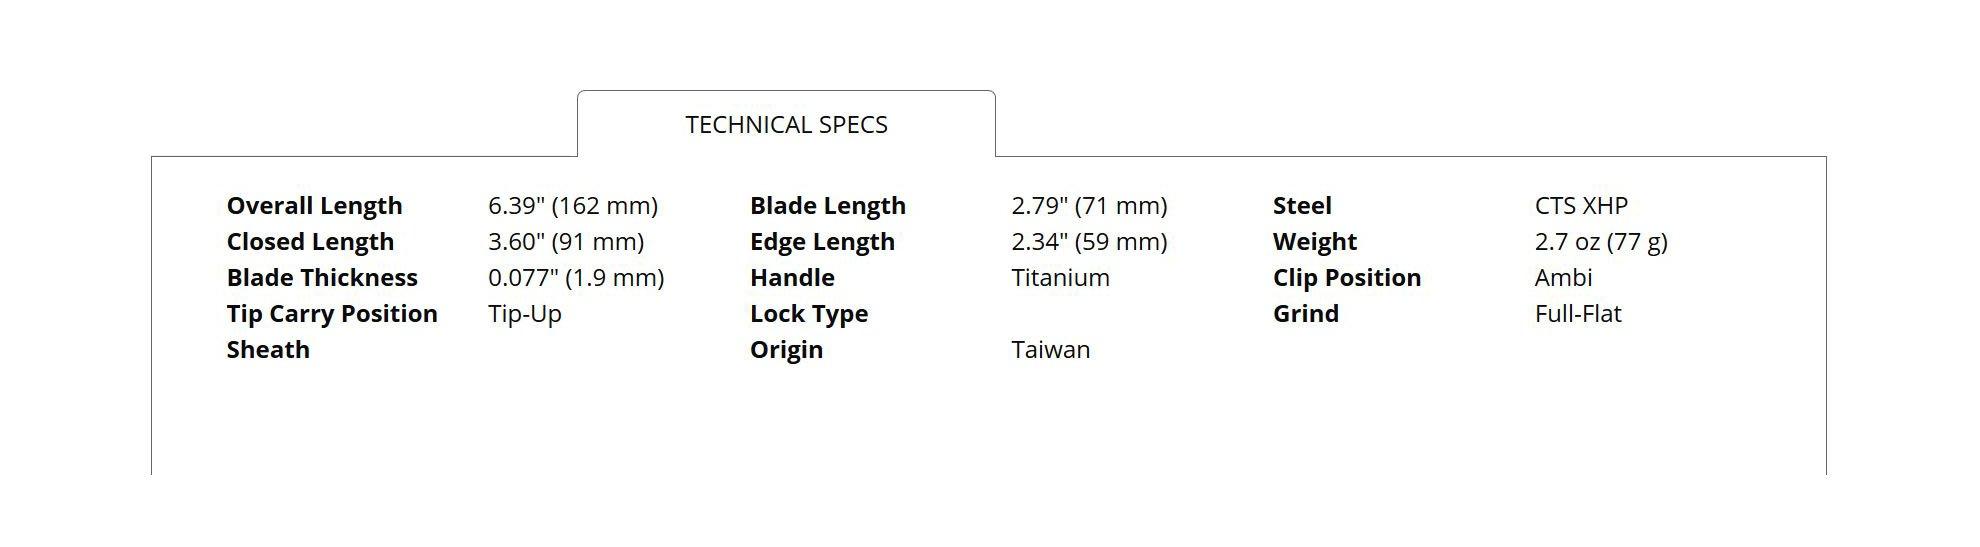 Spyderco C152STIBLP Chaparral Stepped Titanium Folding Knife, Blue, 2.79-Inch